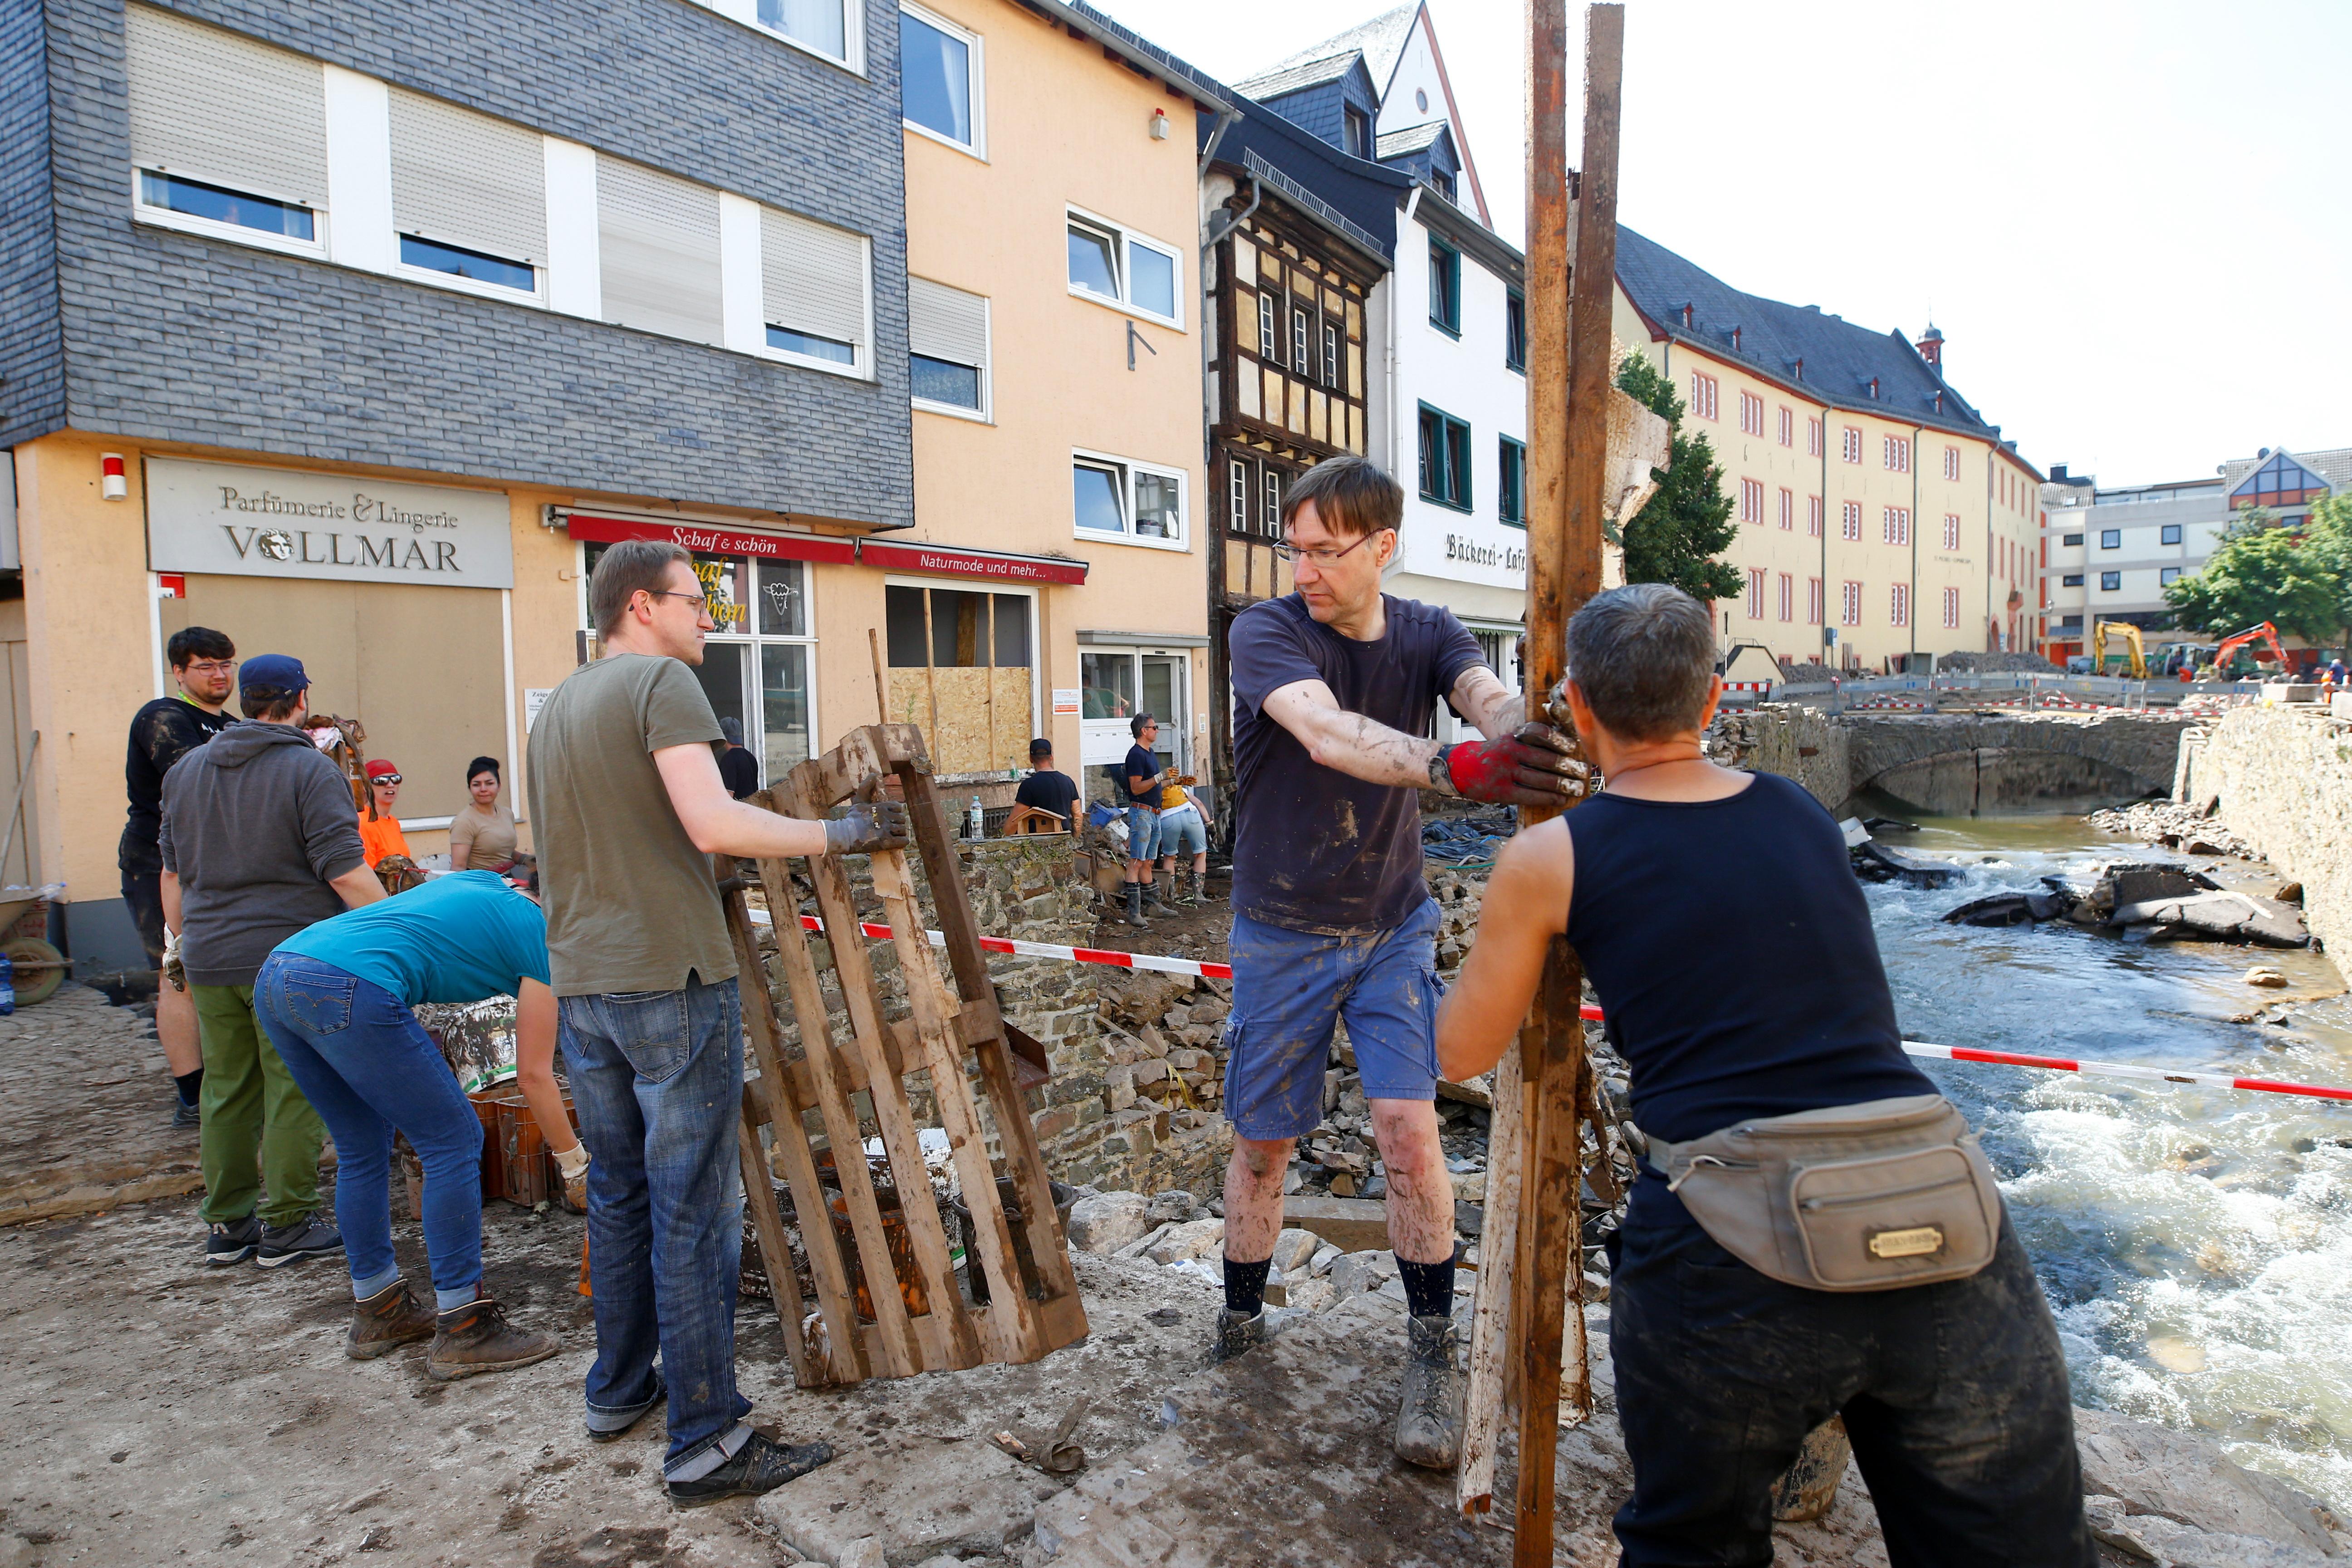 People remove debris and rubbish, following heavy rainfalls, in Bad Muenstereifel, North Rhine-Westphalia state, Germany, July 21, 2021. REUTERS/Thilo Schmuelgen